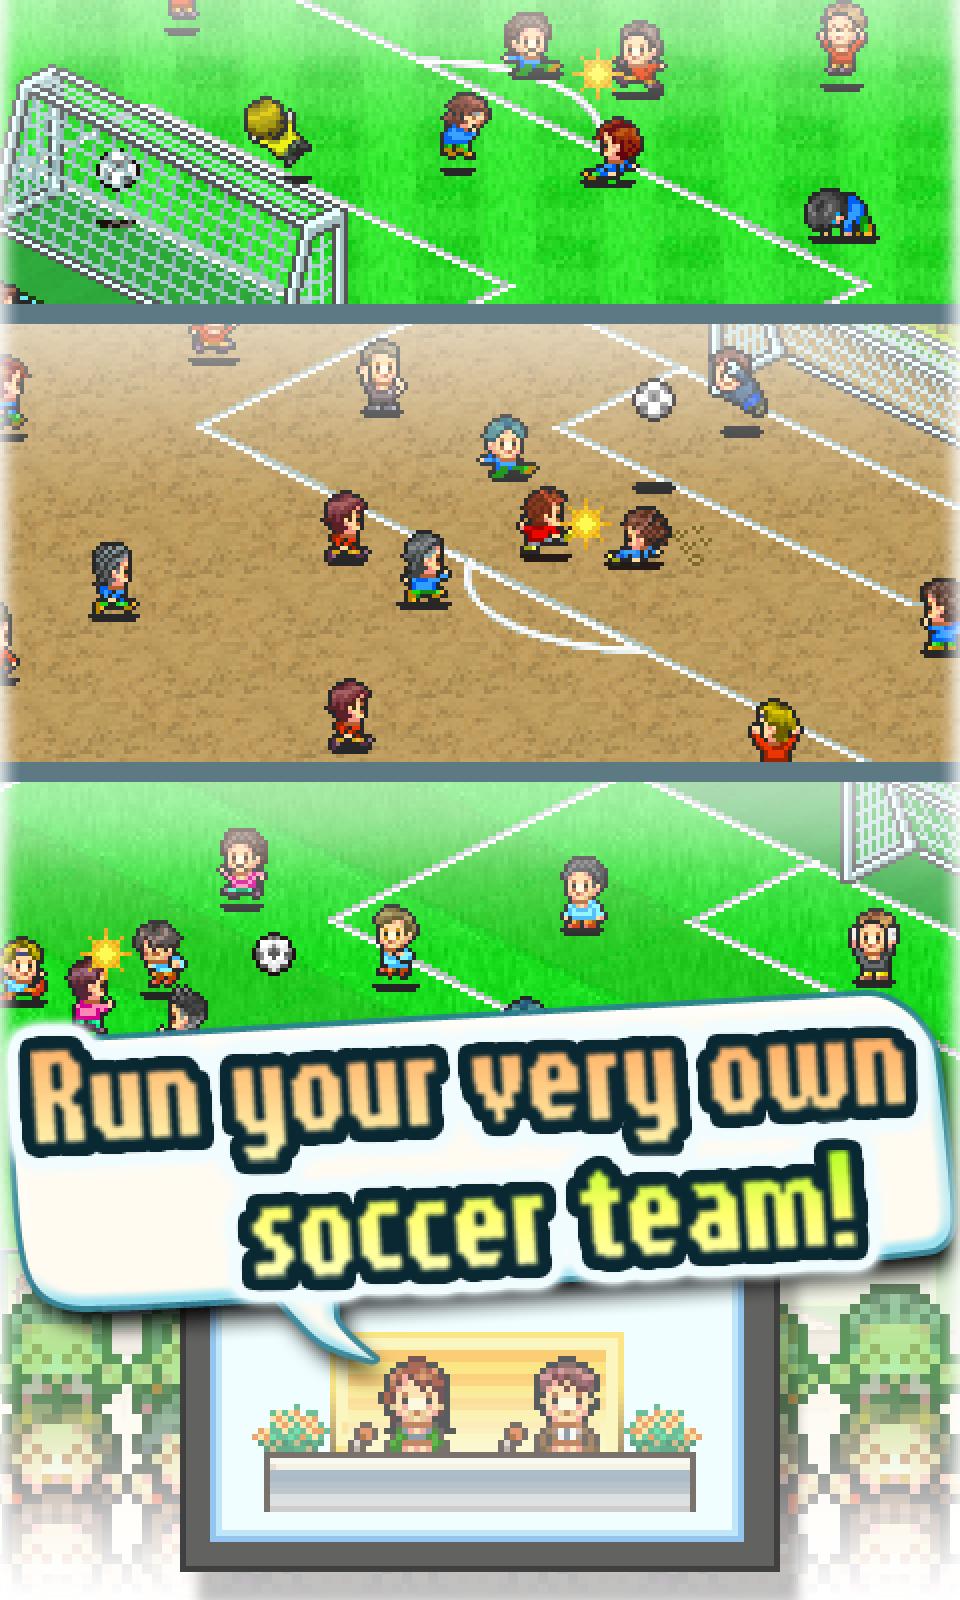 Pocket League Story 2 screenshot #10